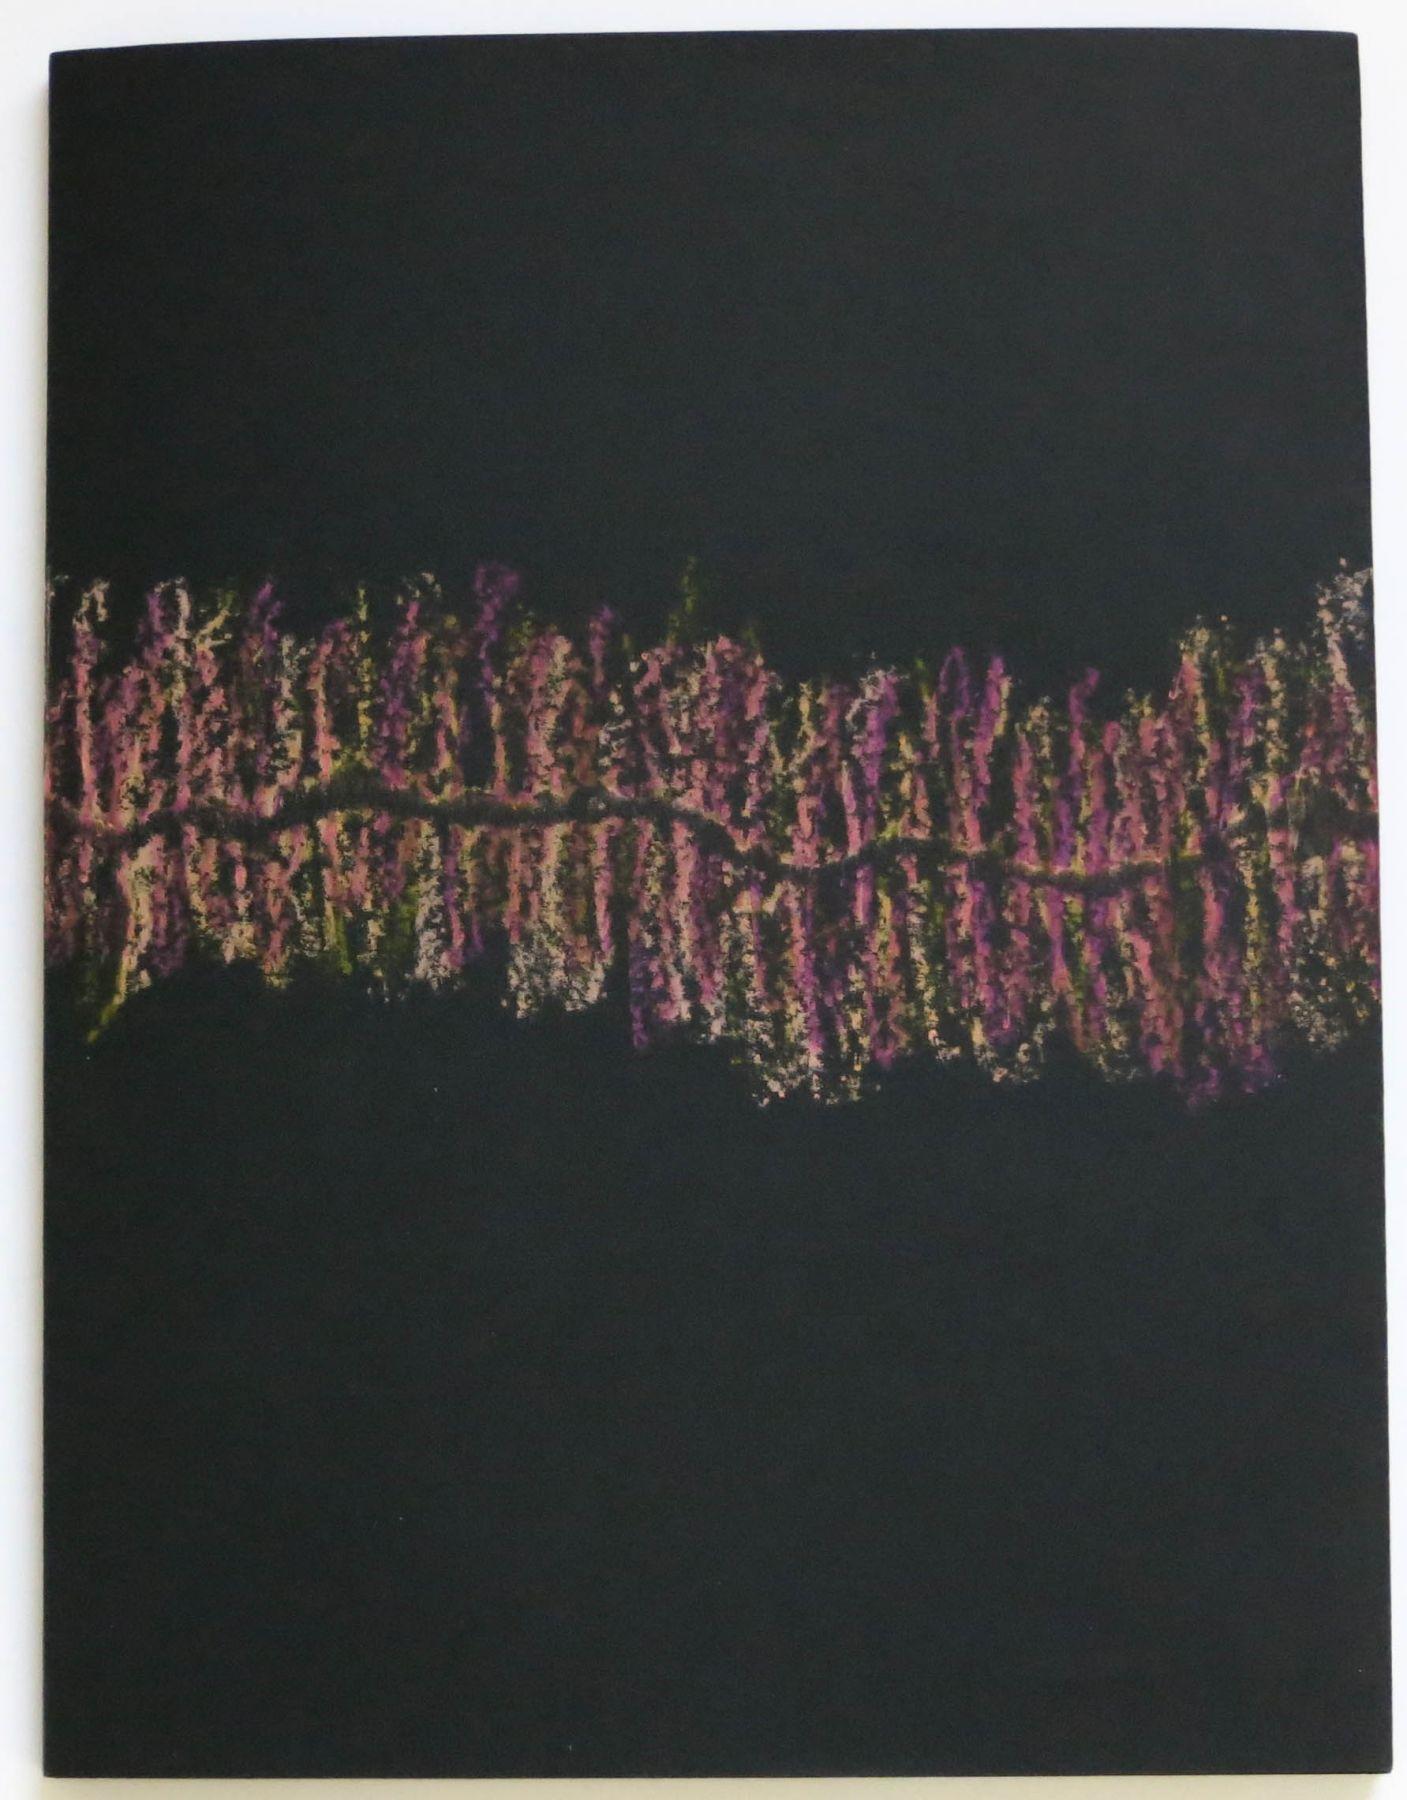 Sam Falls, Studio Space Print/Time